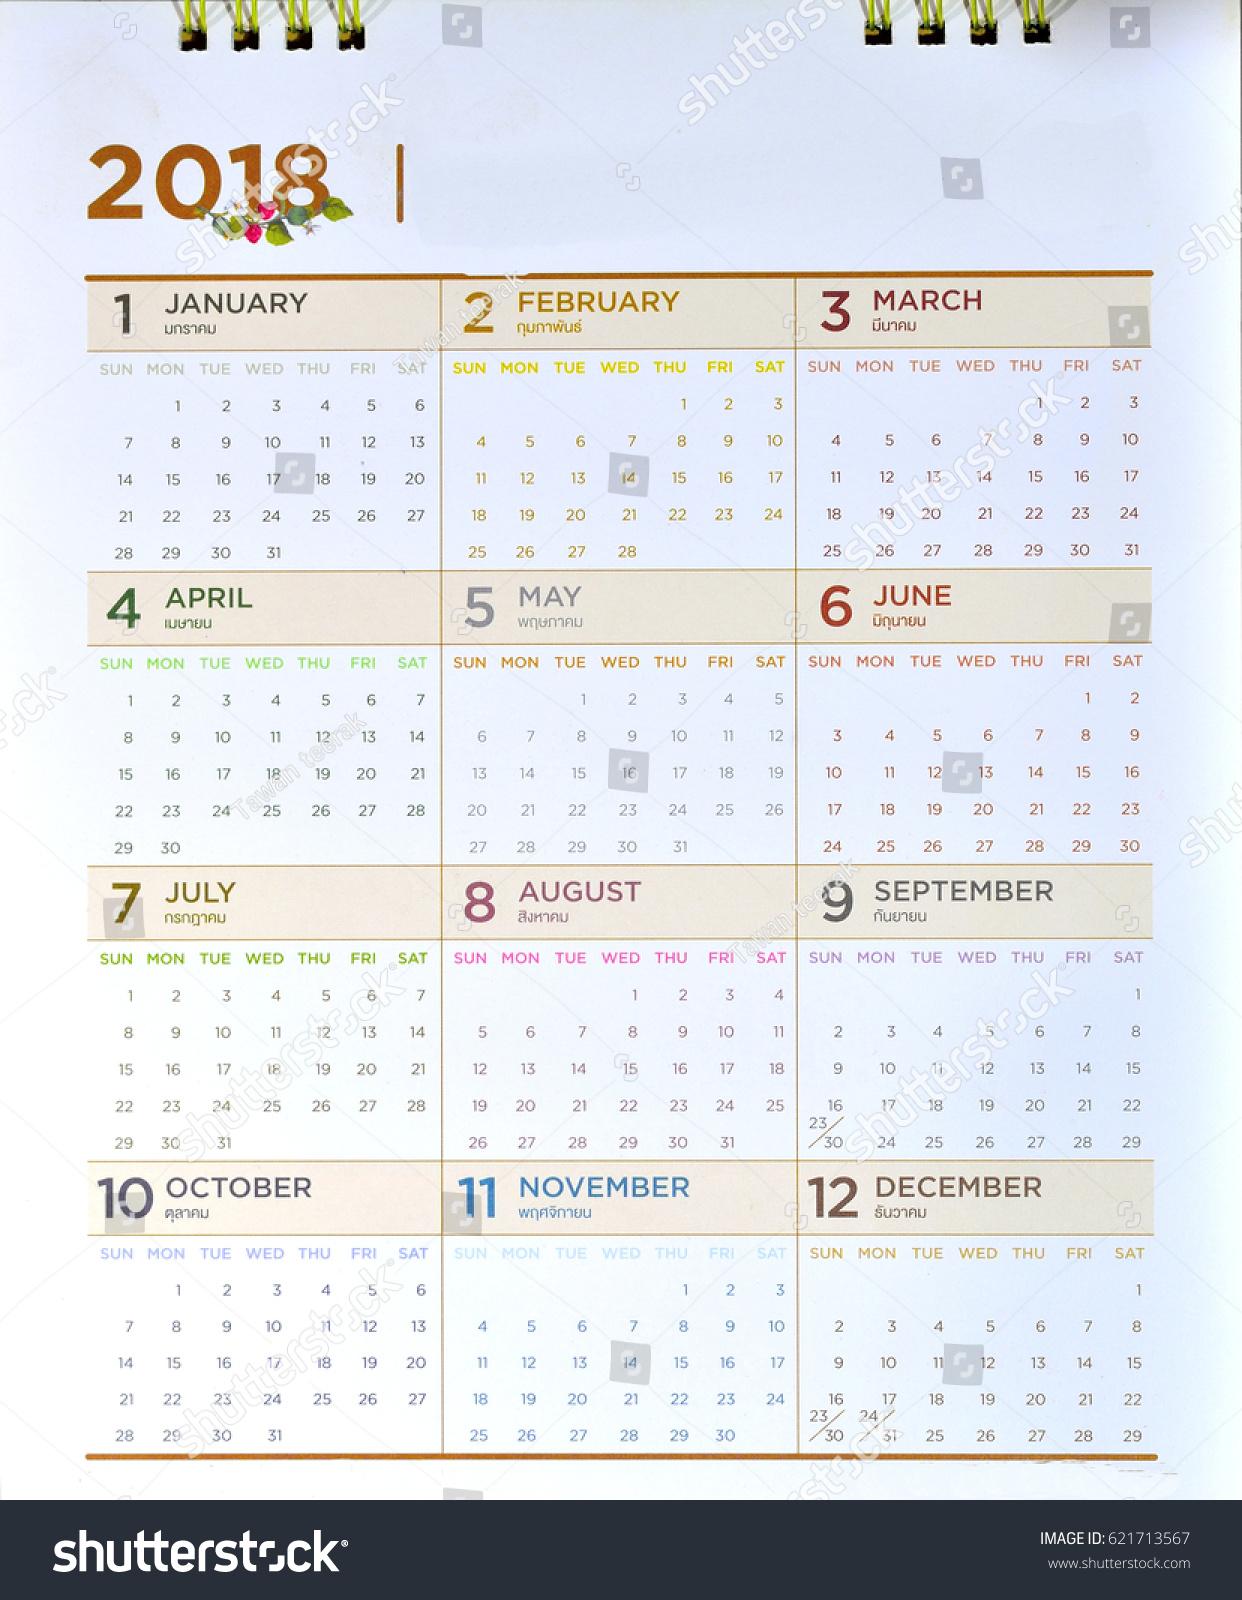 Happy new year 2018 calendar design.